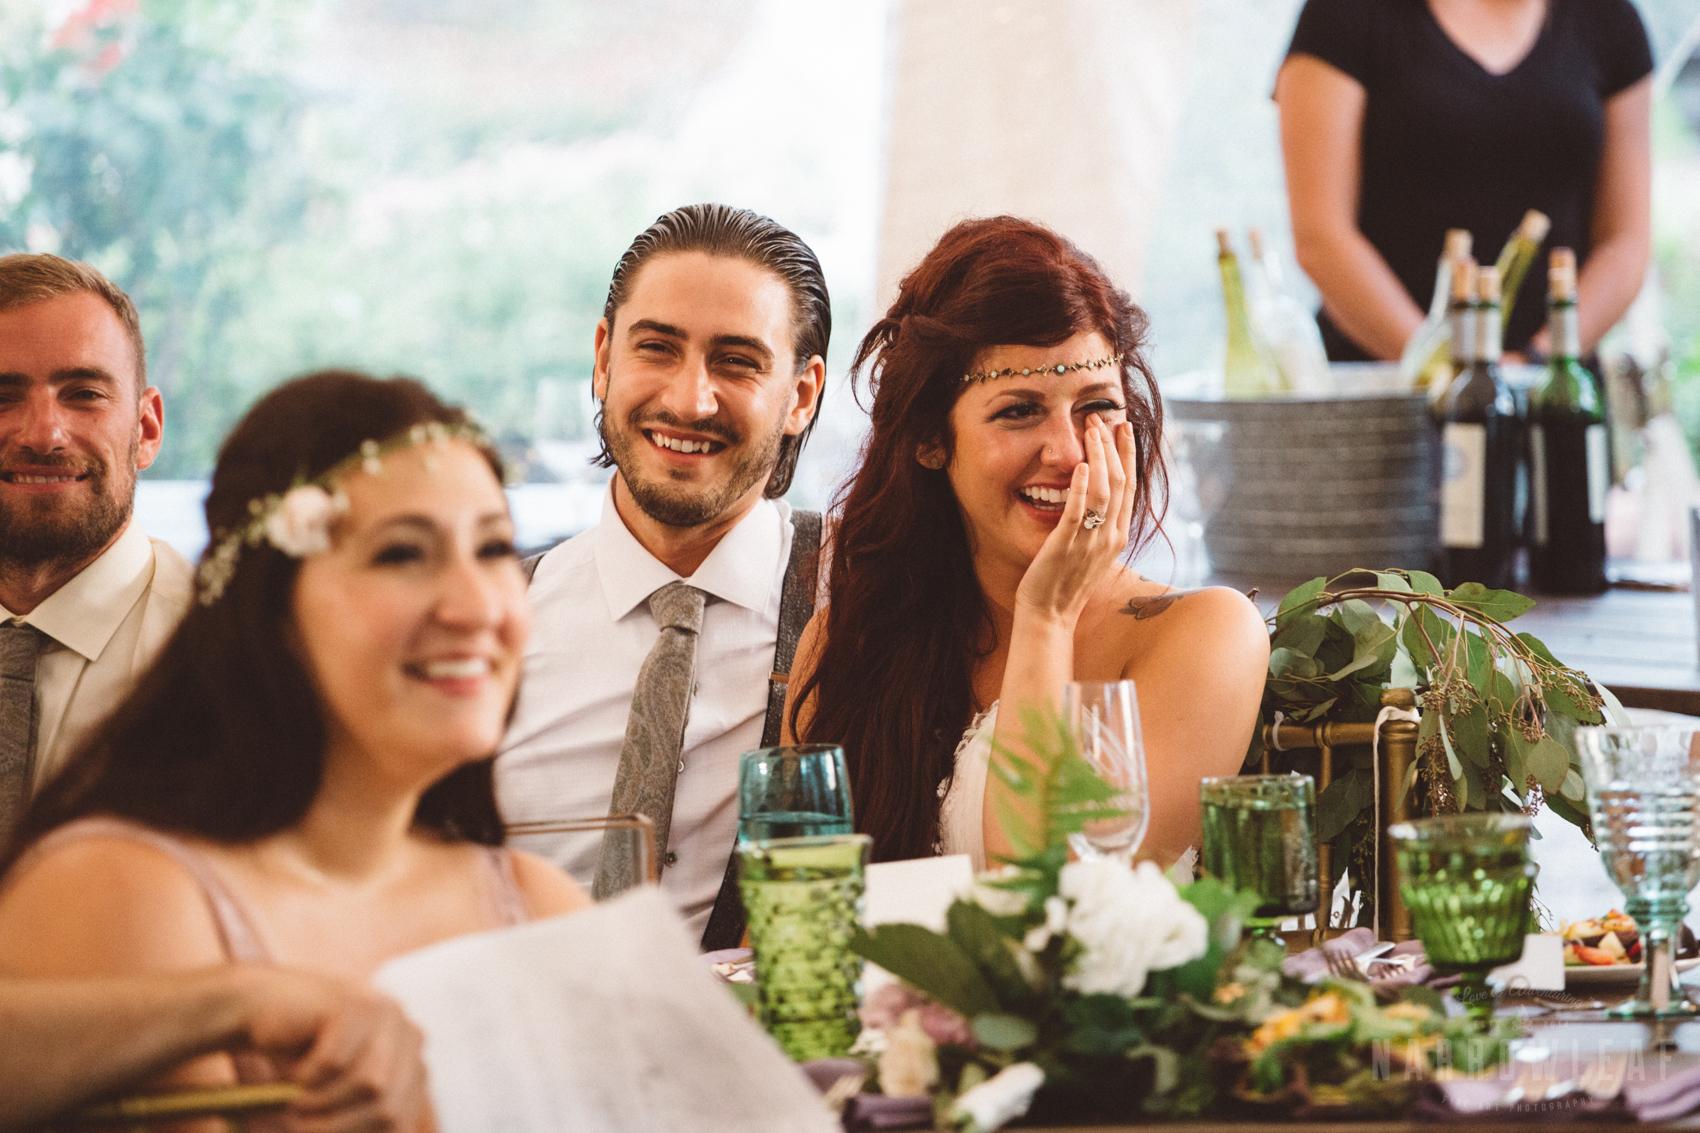 Lake-Geneva-Wisconsin-Wedding-dinner-outdoor-reception-4741.jpg